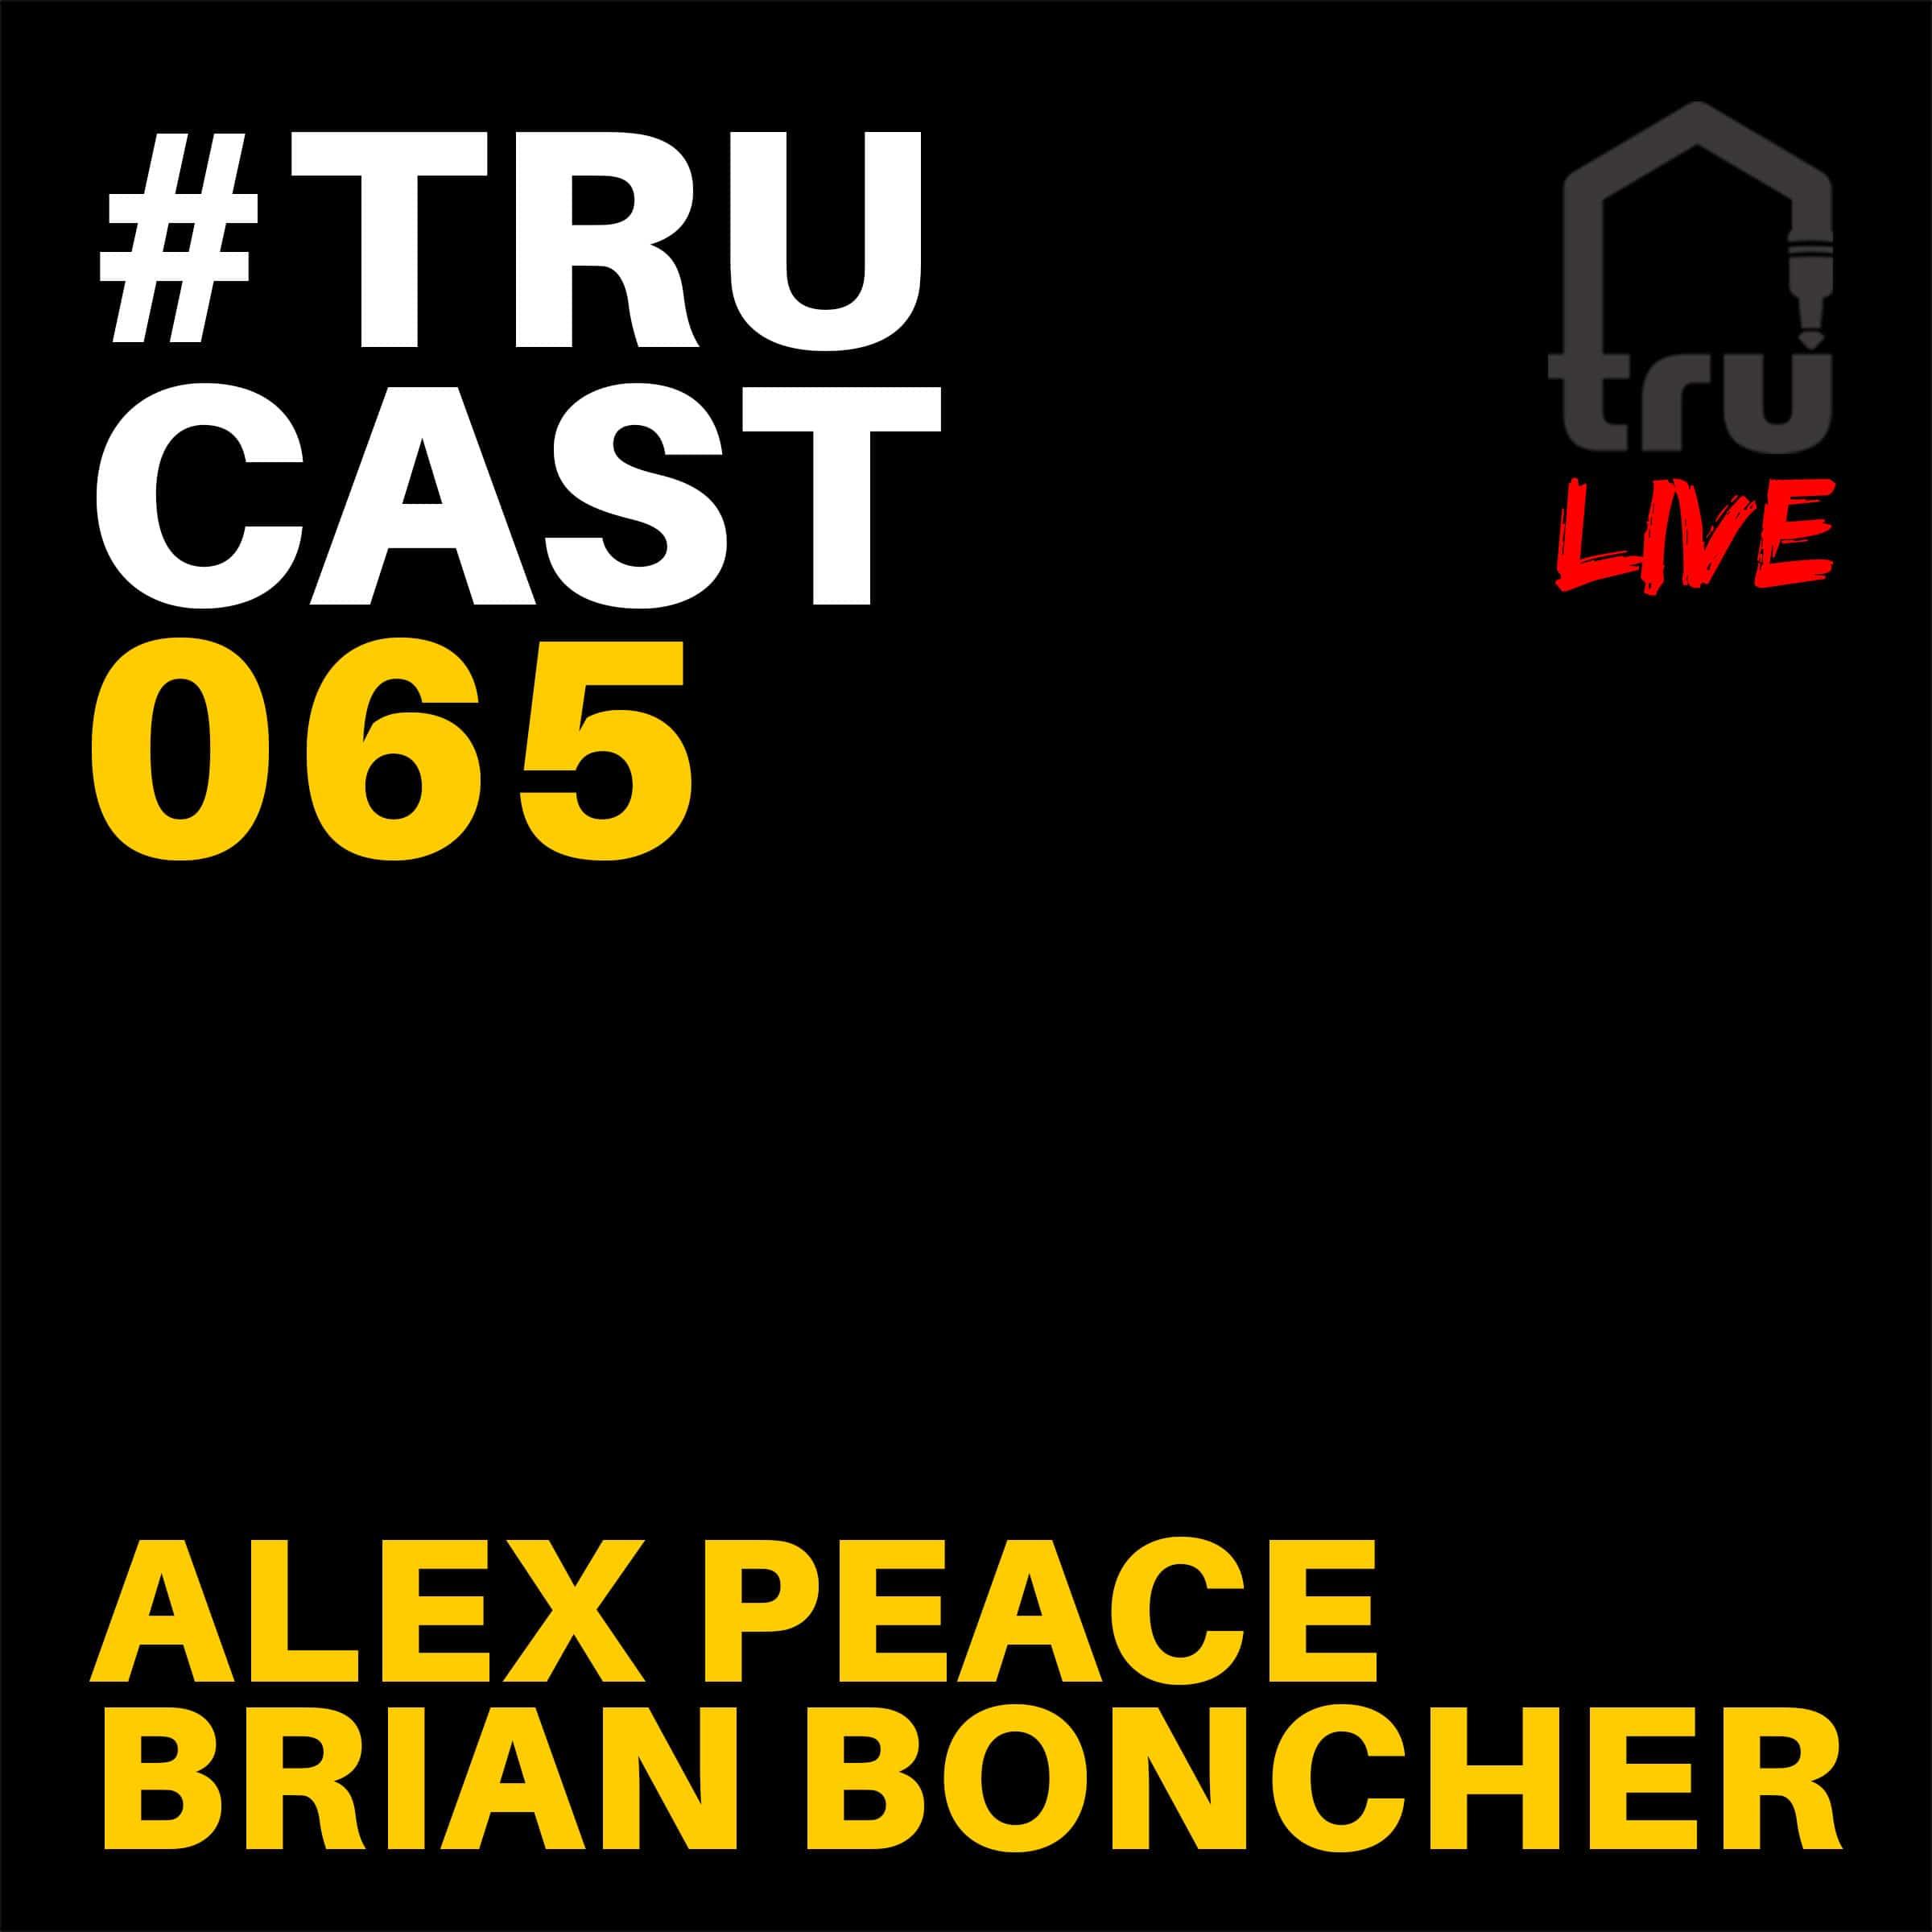 TRUcast 065 LIVE